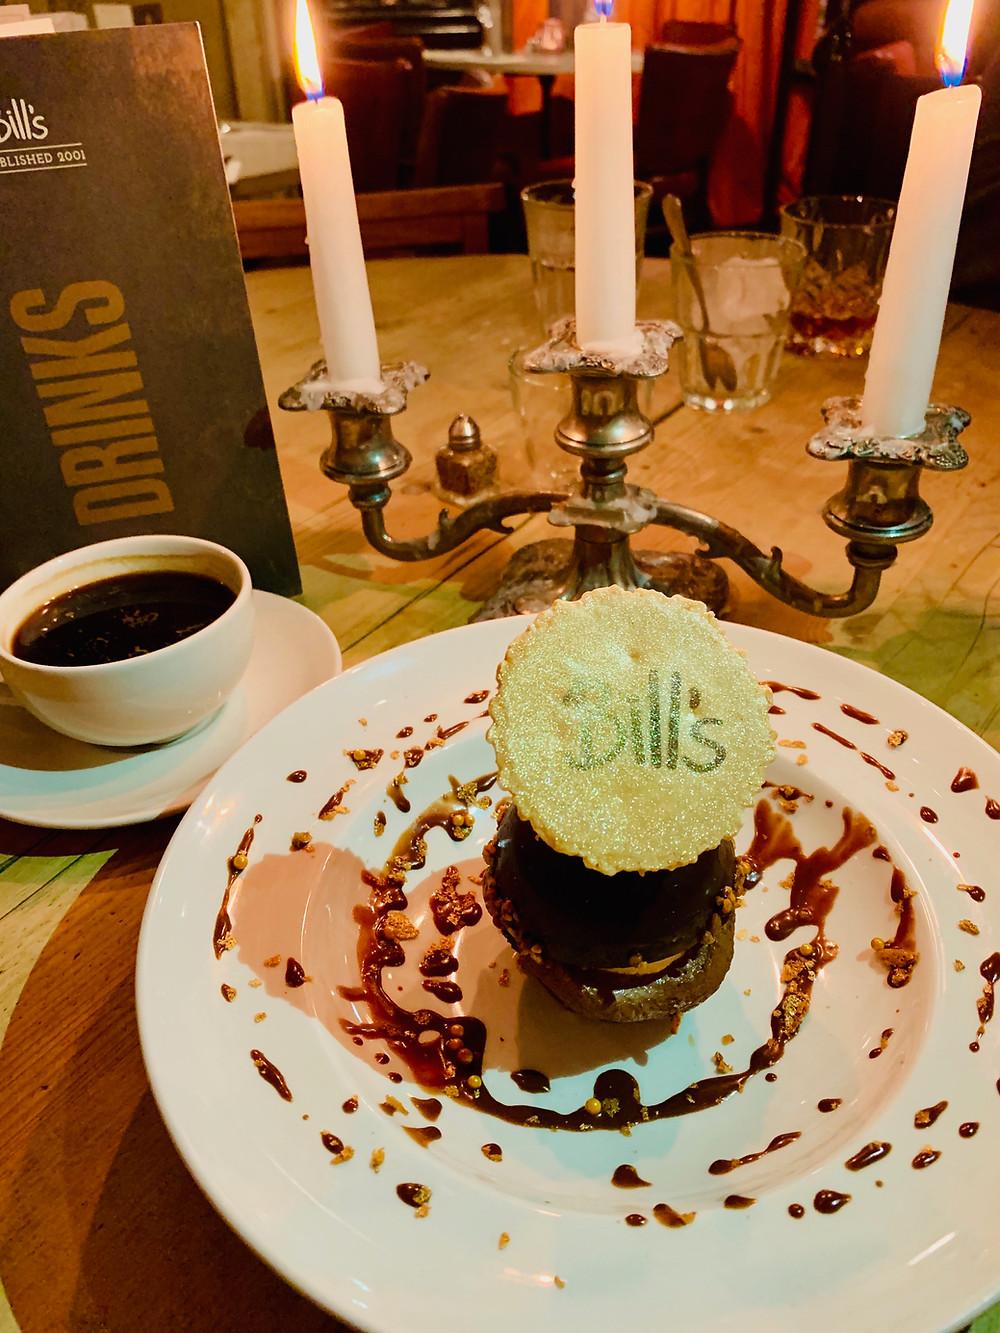 Bill's chocolate and hazelnut praline sphere